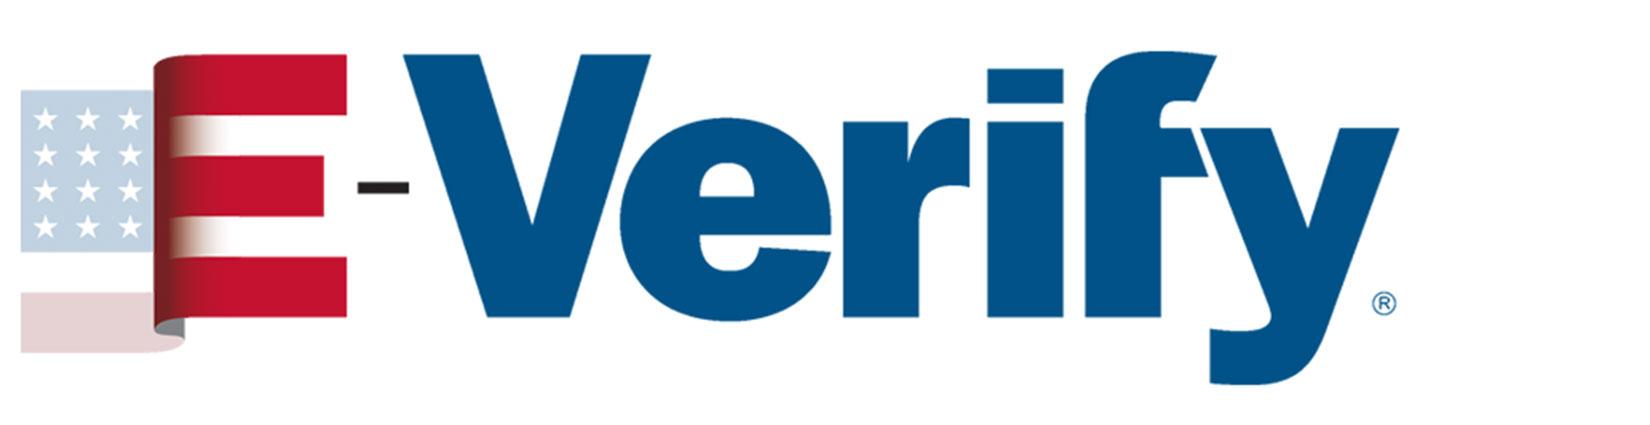 logo-everify-banner.jpg